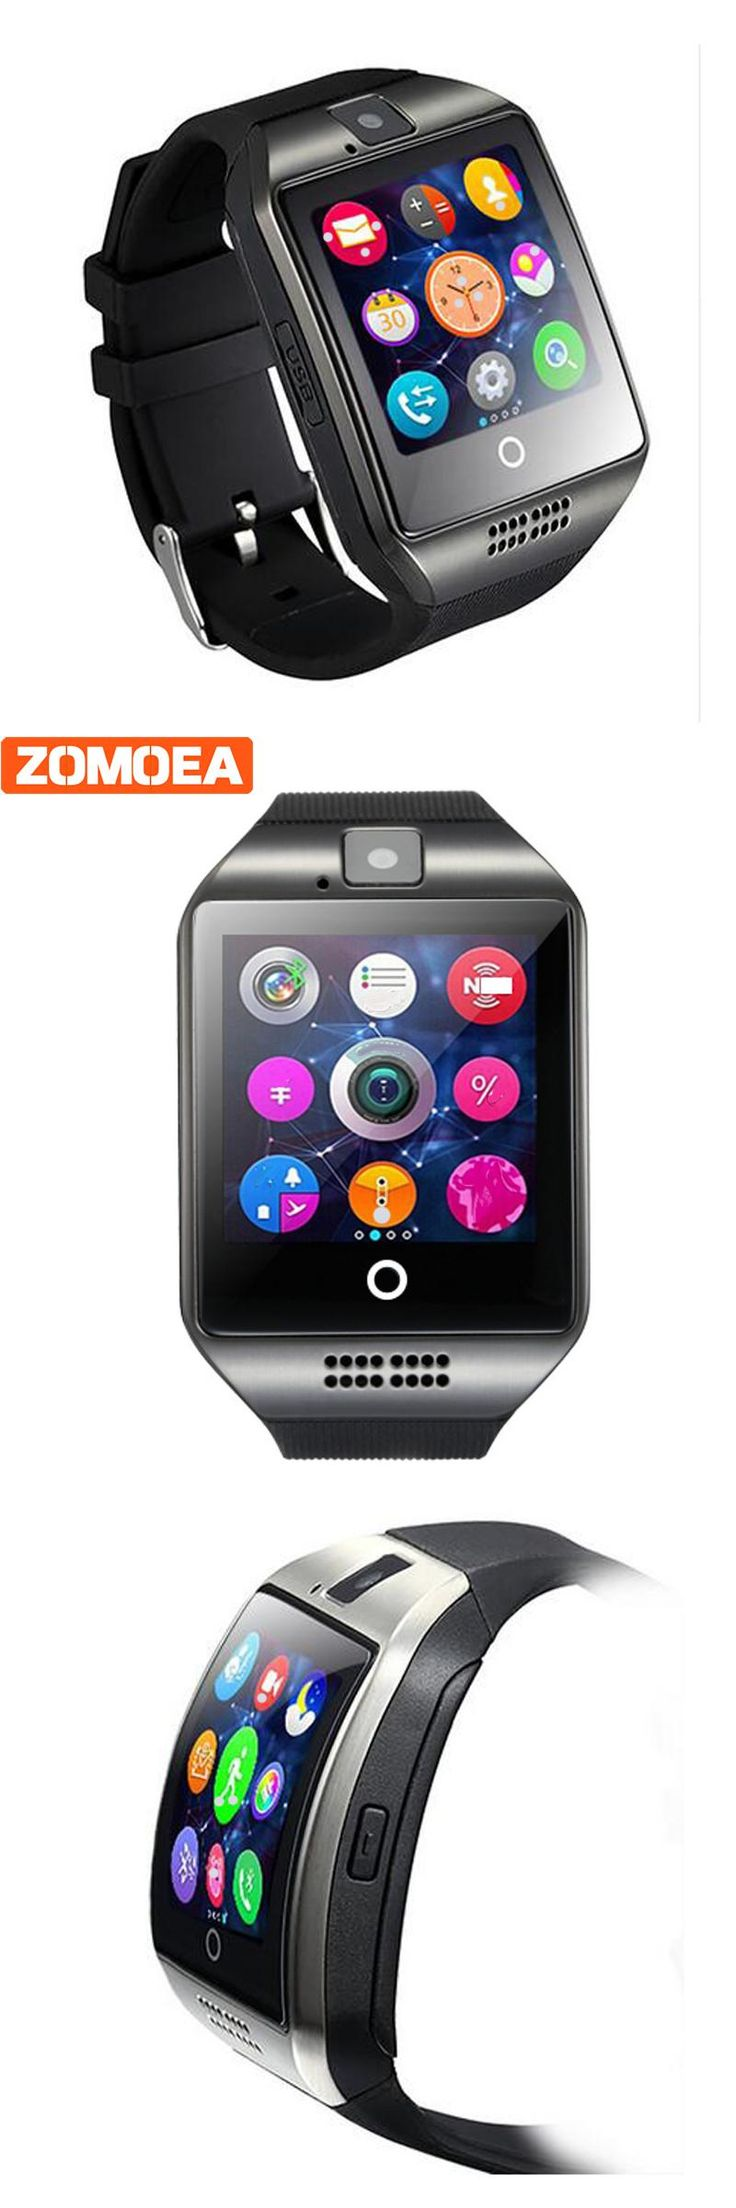 smart watch for android support sSIM Card bluetooth men women sport reloj inteligente for Samsung phone wearable PK GT08 DZ09